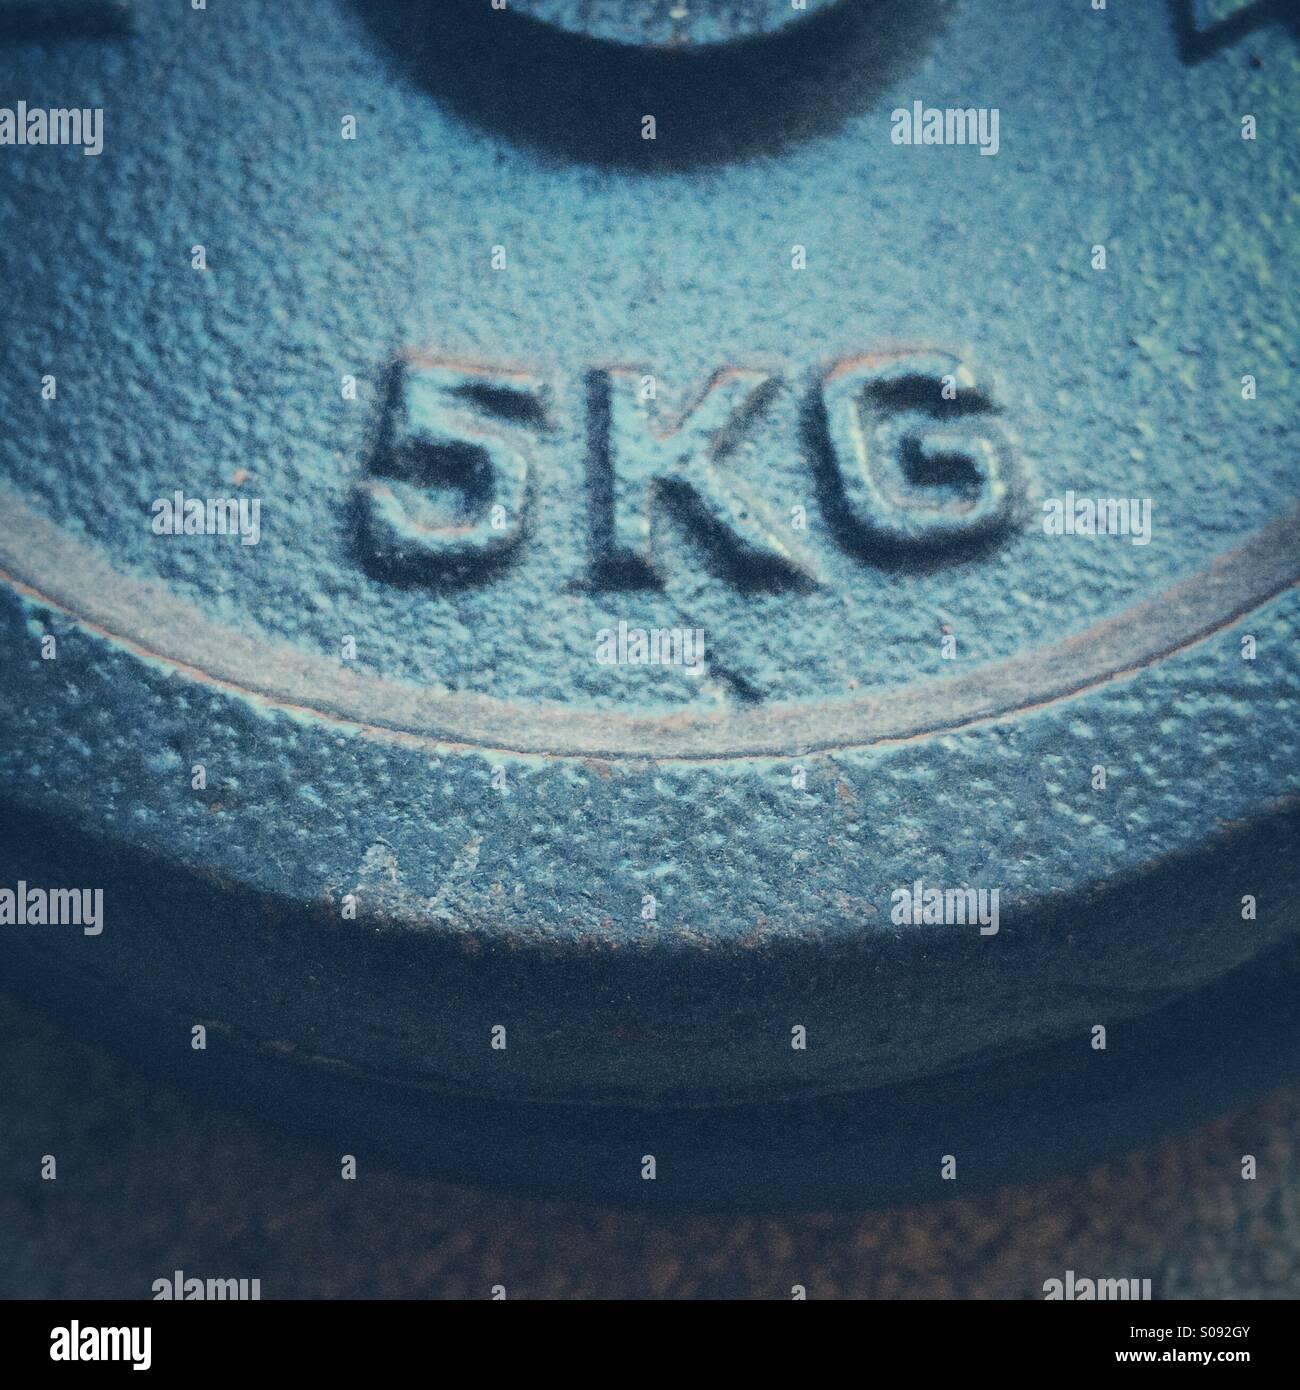 5kg kilogram weight - Stock Image